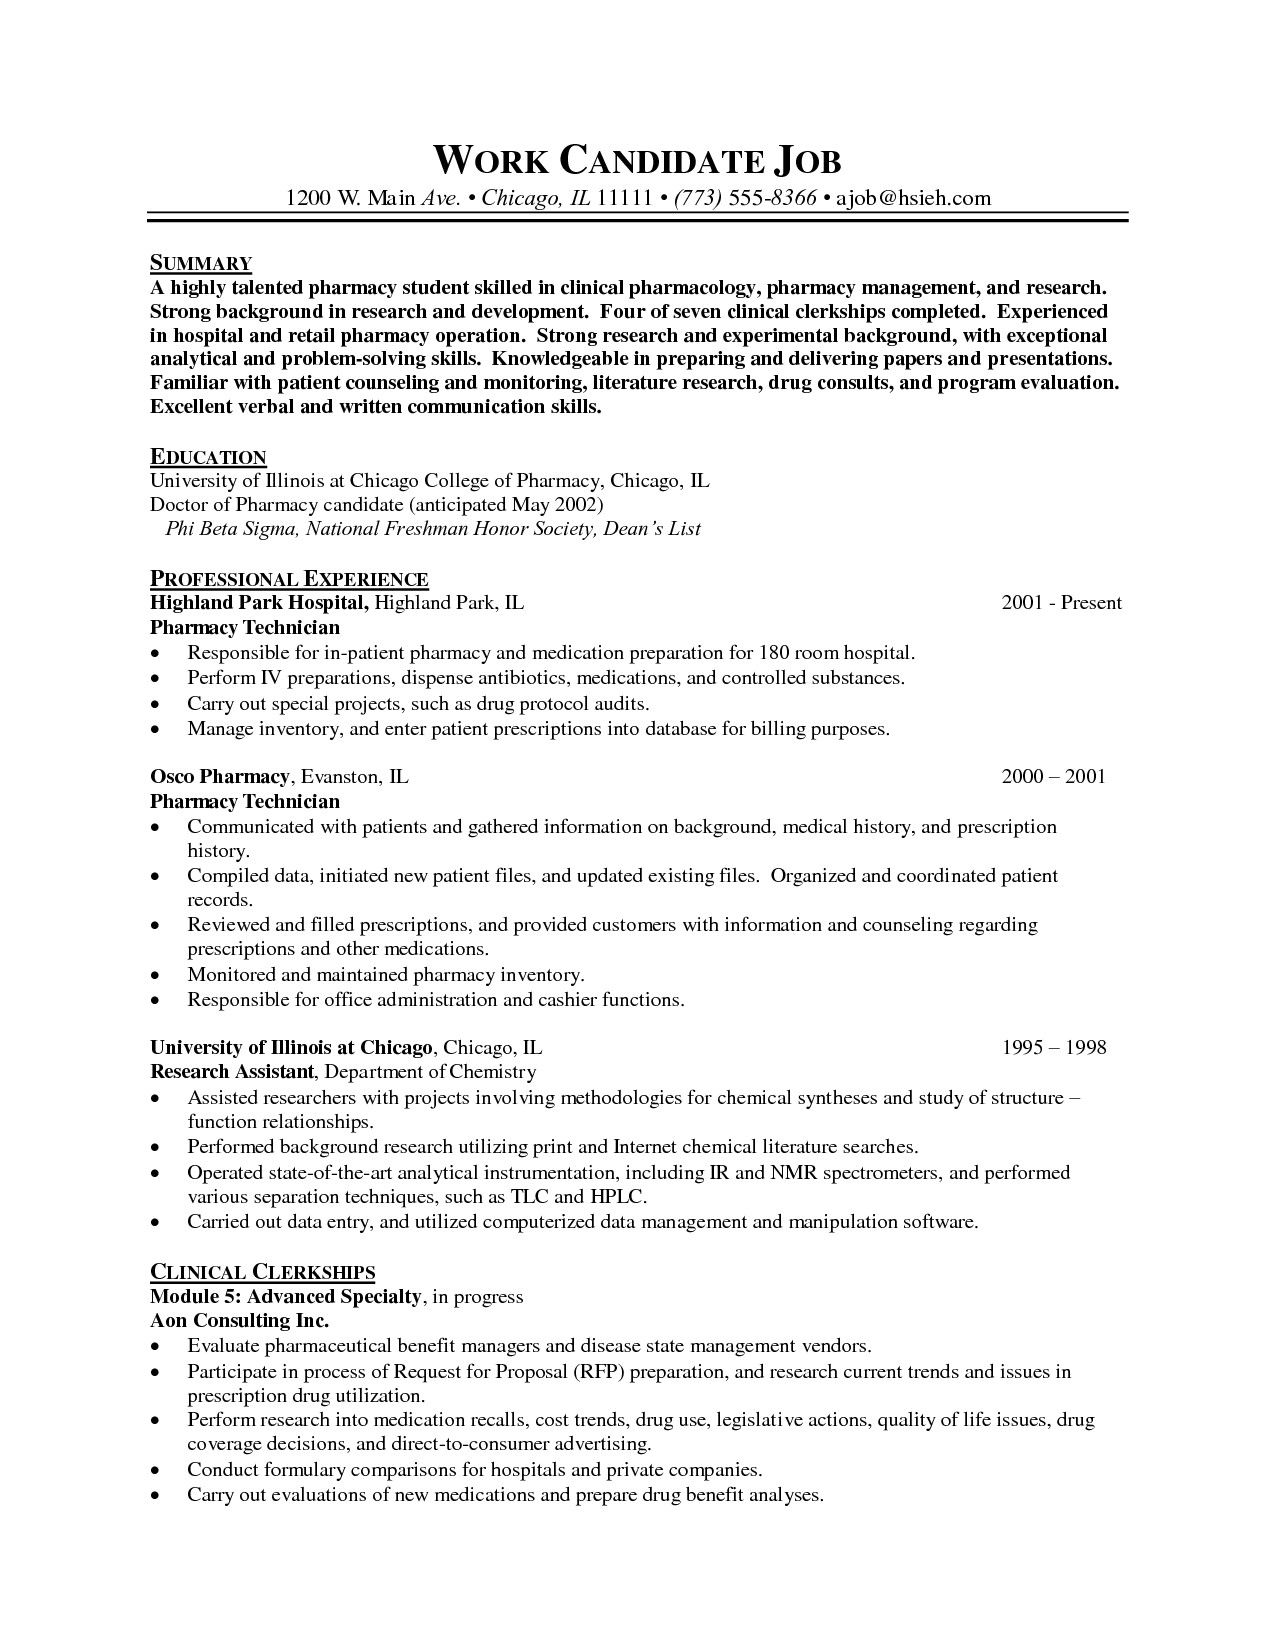 Pharmacy Technician Resume Objectives Original Pharmacy Technician Resume Skills Of 40 Incred Resume Skills Pharmacy Technician Cover Letter For Resume